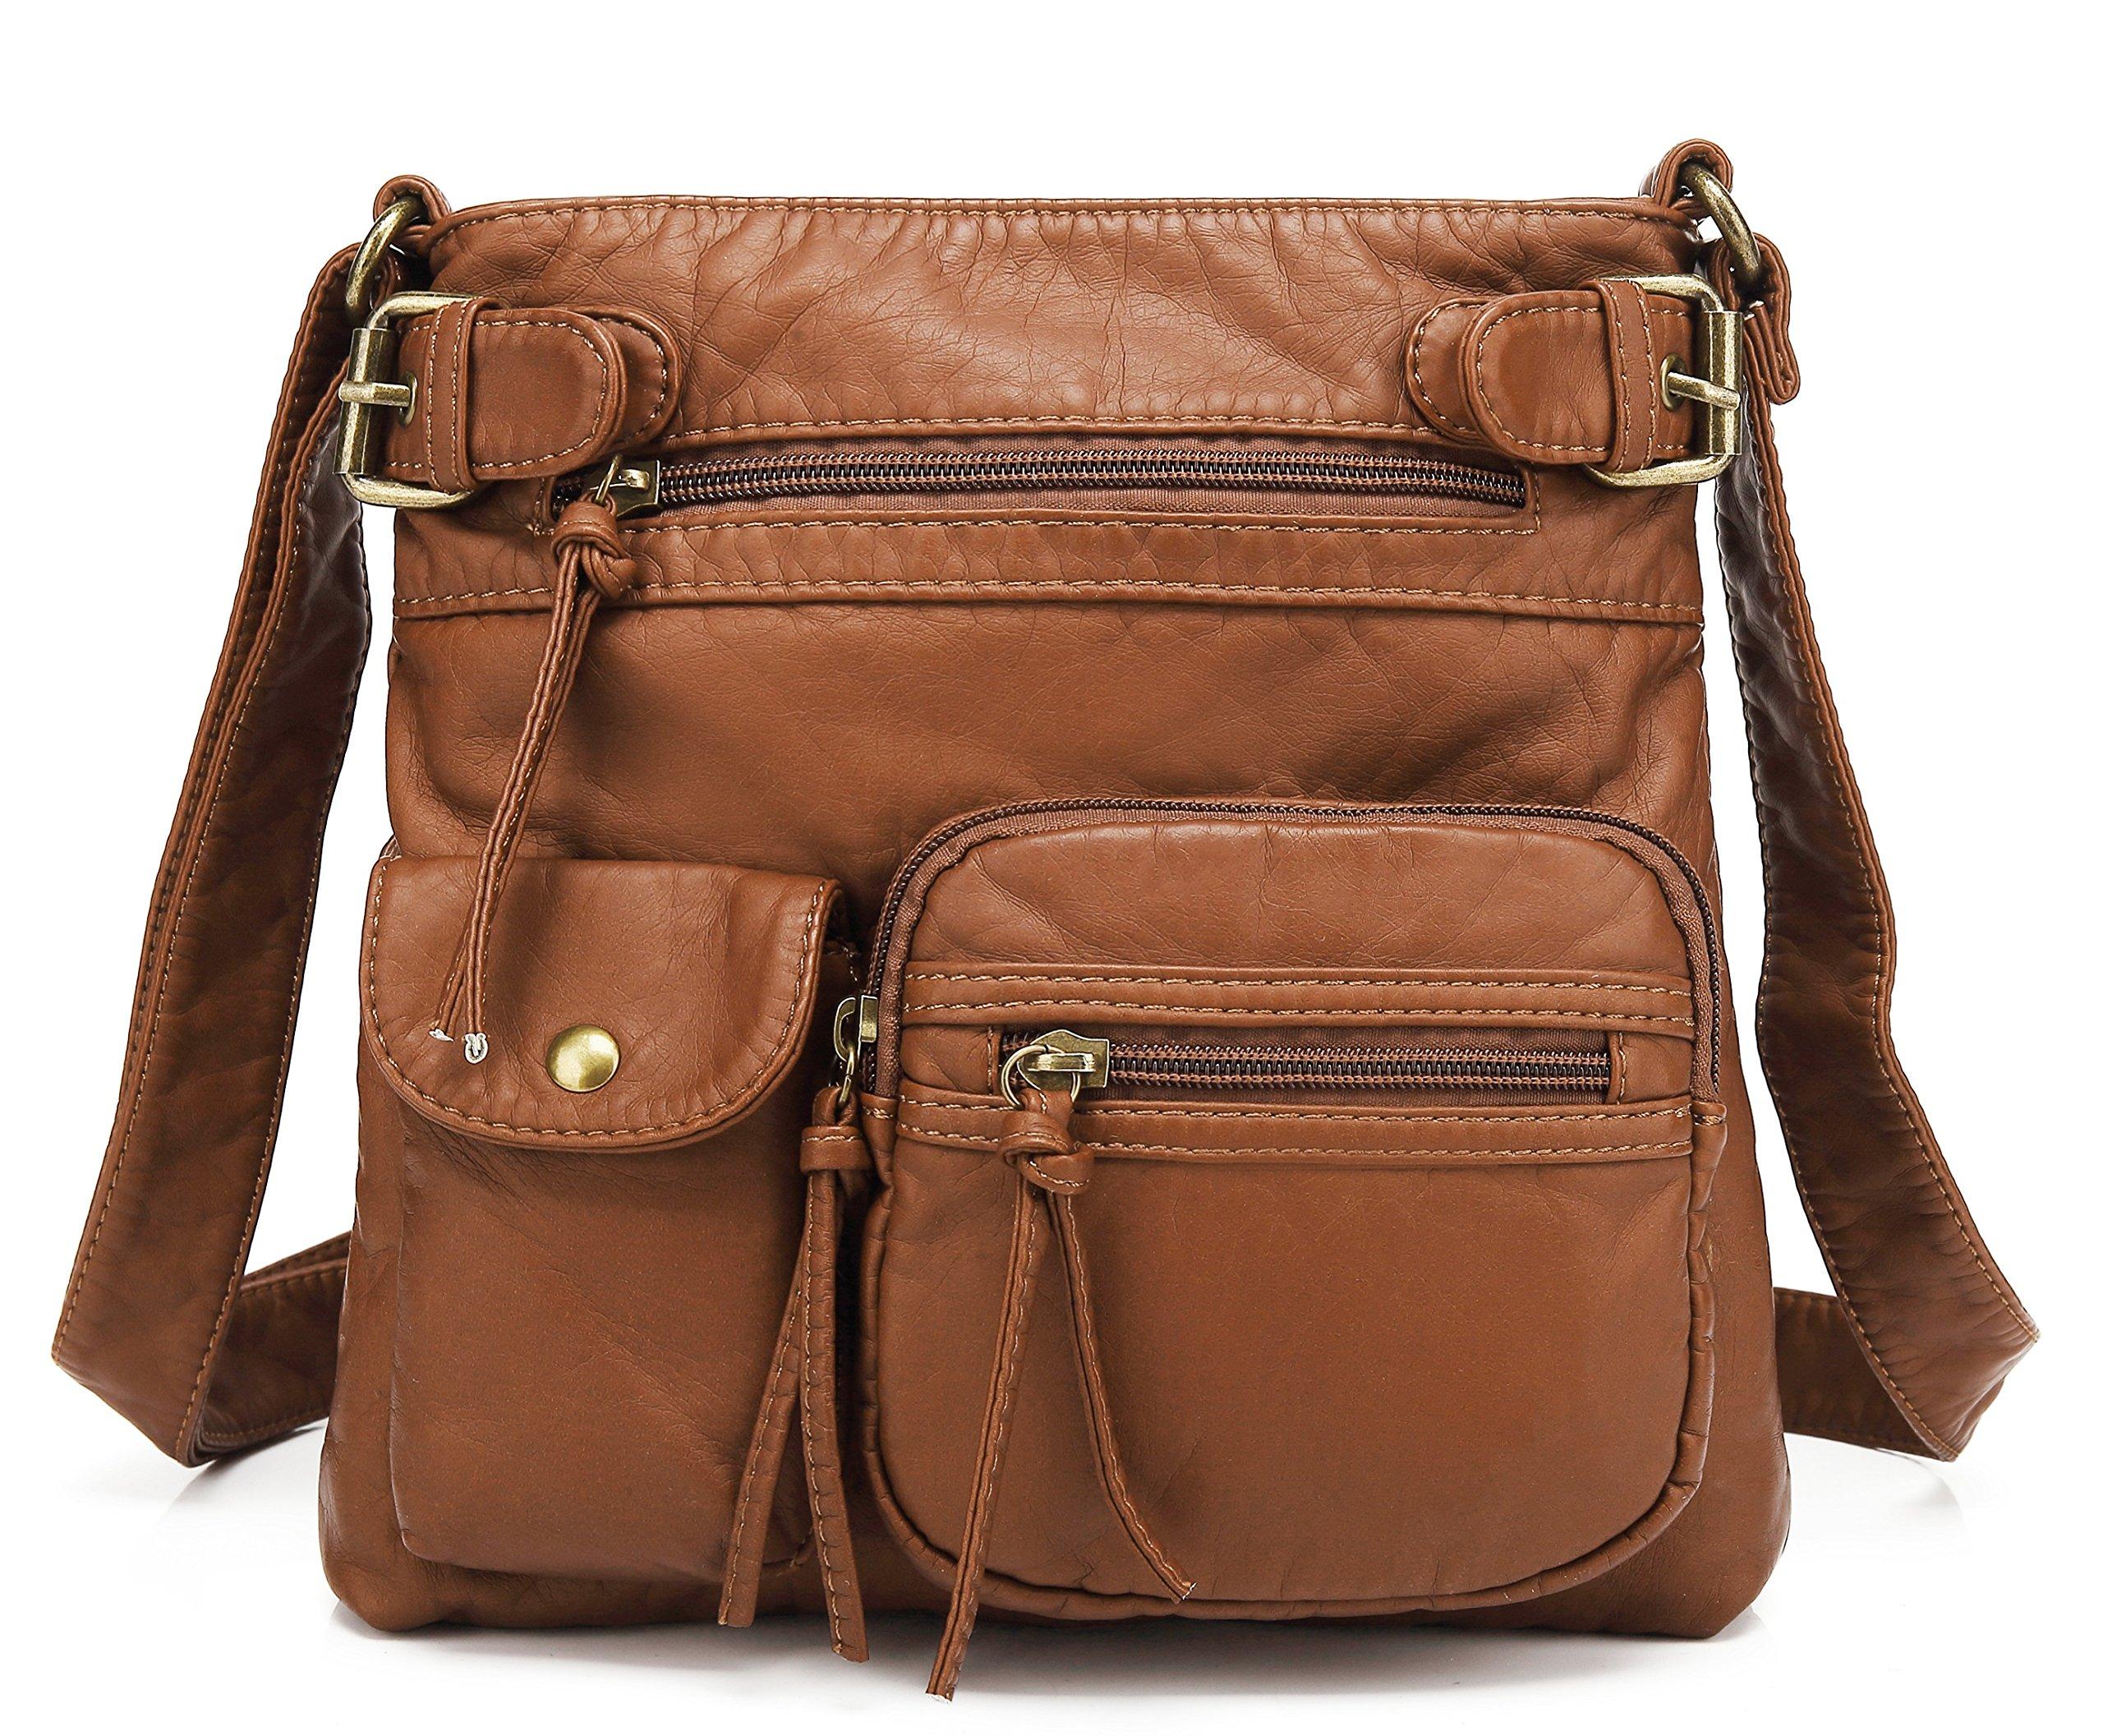 Scarleton Accent Top Belt Crossbody Bag H183304 - Cognac